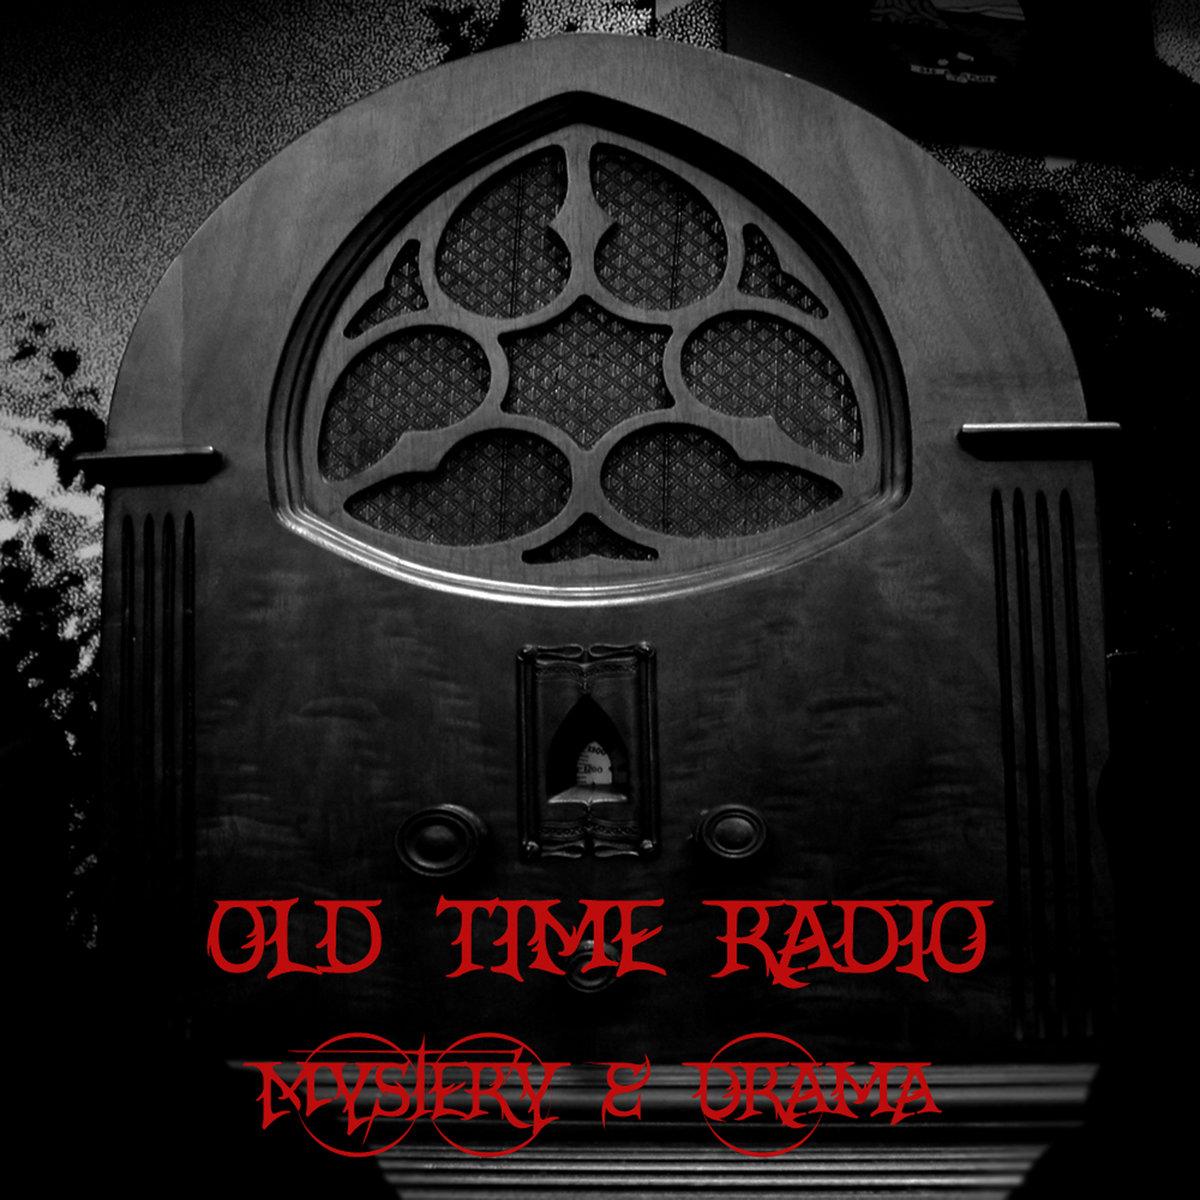 Old Time Radio: Mystery & Drama | Old Time Radio